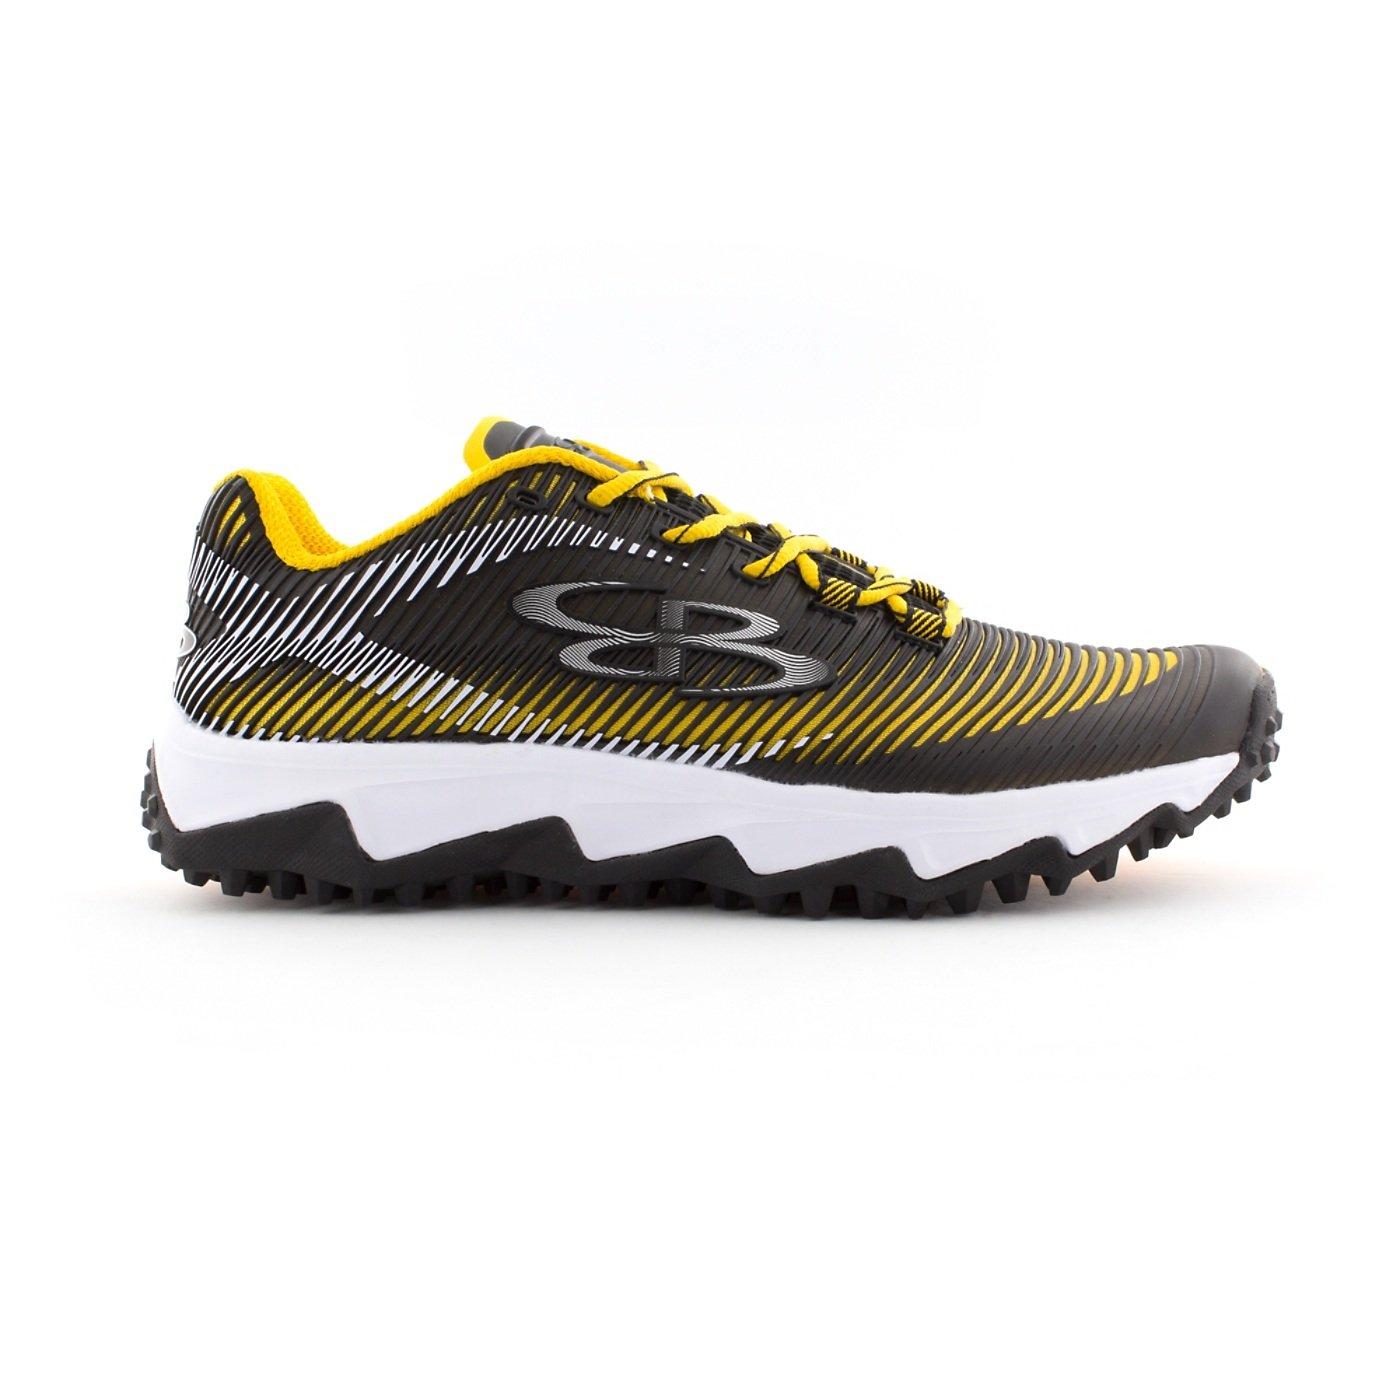 Boombah Men's Aftershock DPS Turf Shoes - 18 Color Options - Multiple Sizes B0767QZDGC 14|Black/Gold